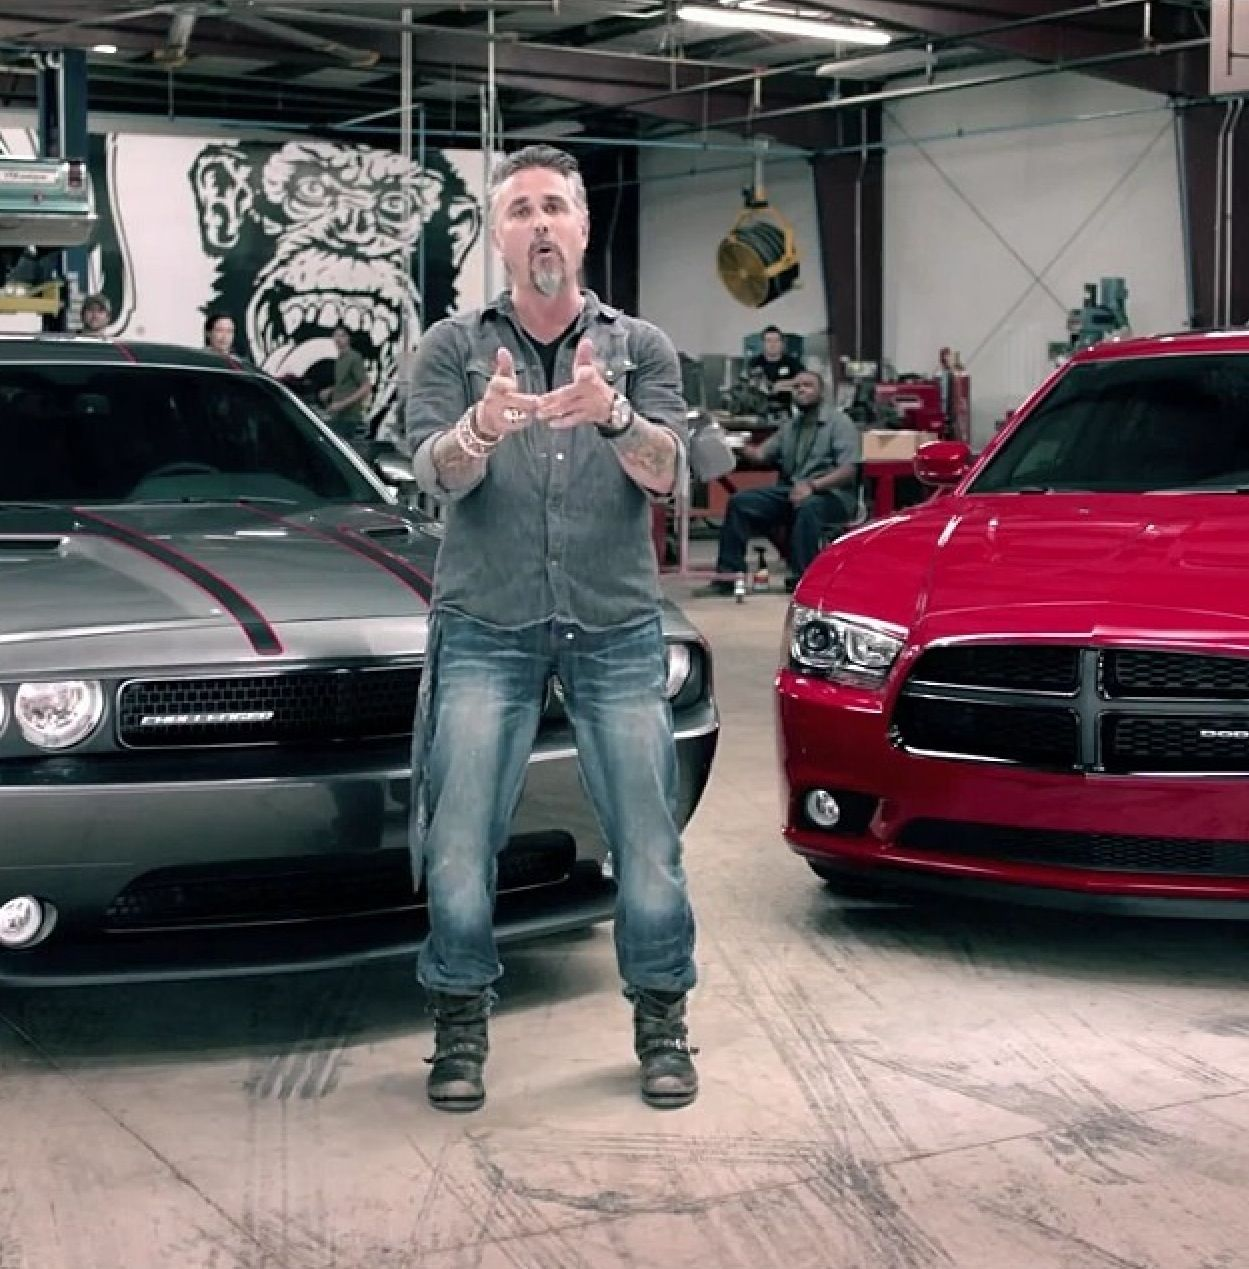 Gas Monkey Garage Richard Rawlings | Texas Hottie, Richard Rawlings